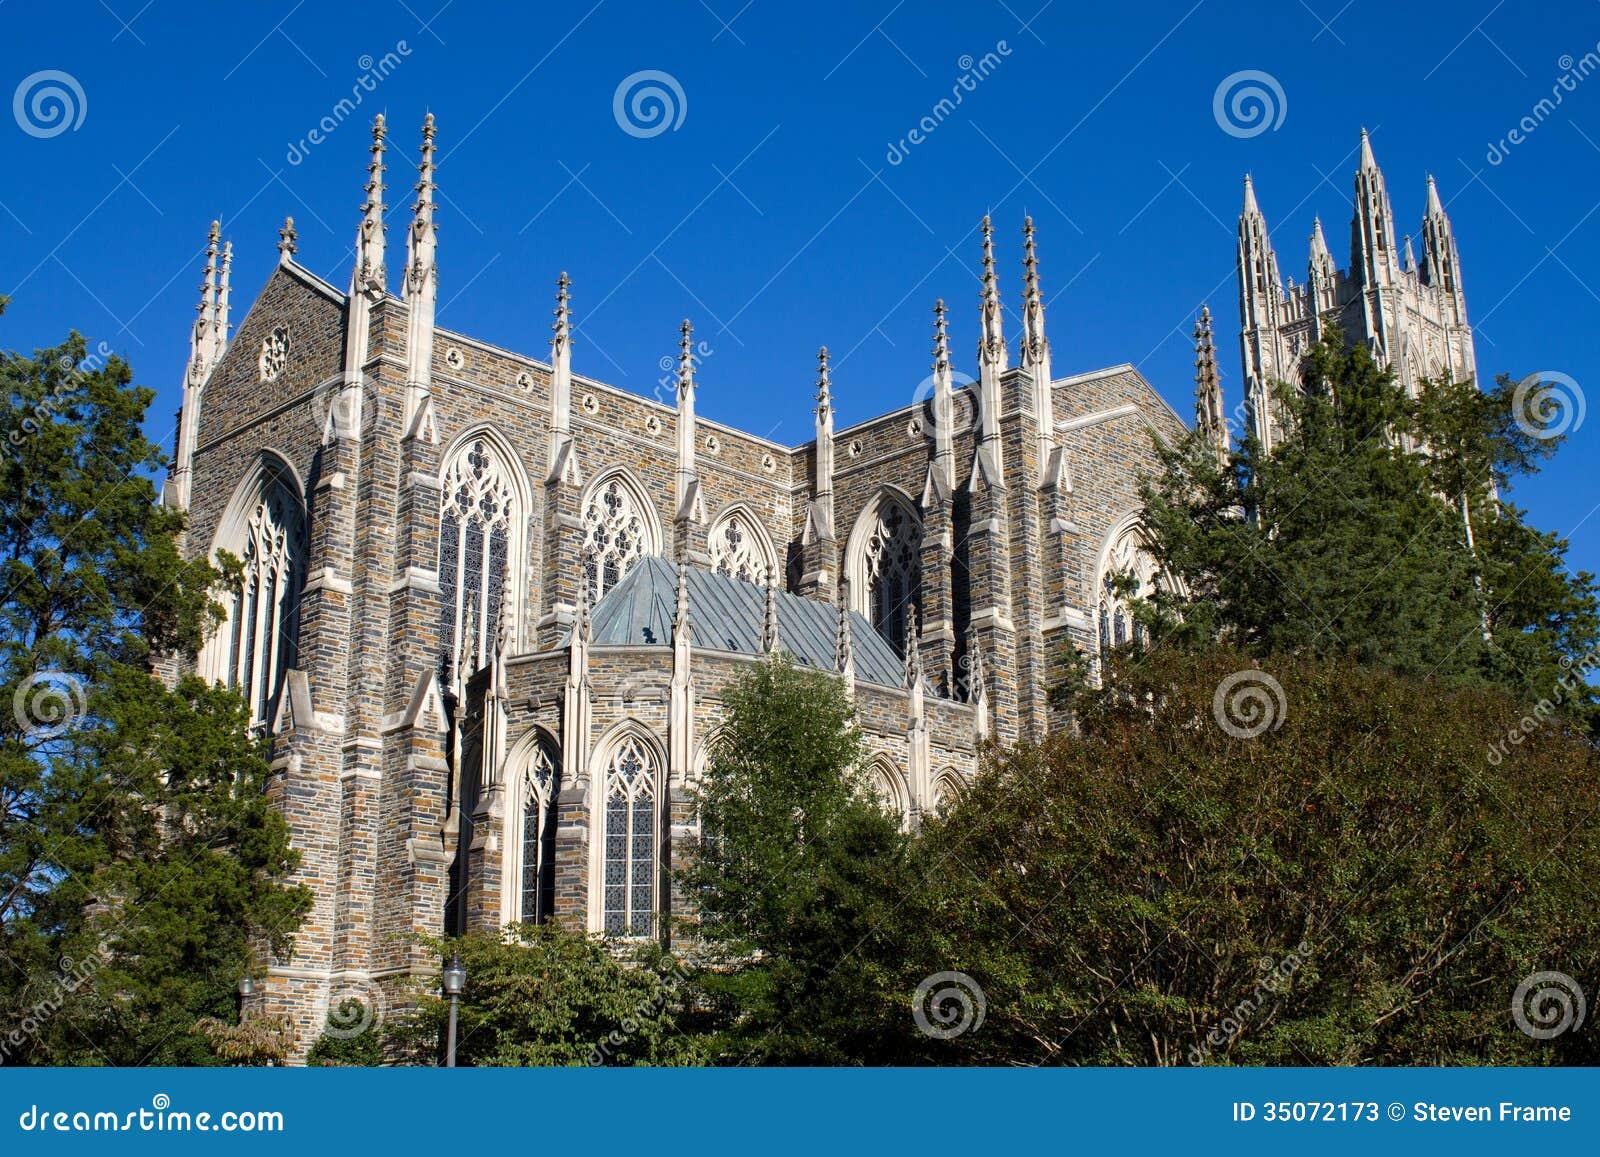 Duke University Chapel Stock Image Image Of Architectural